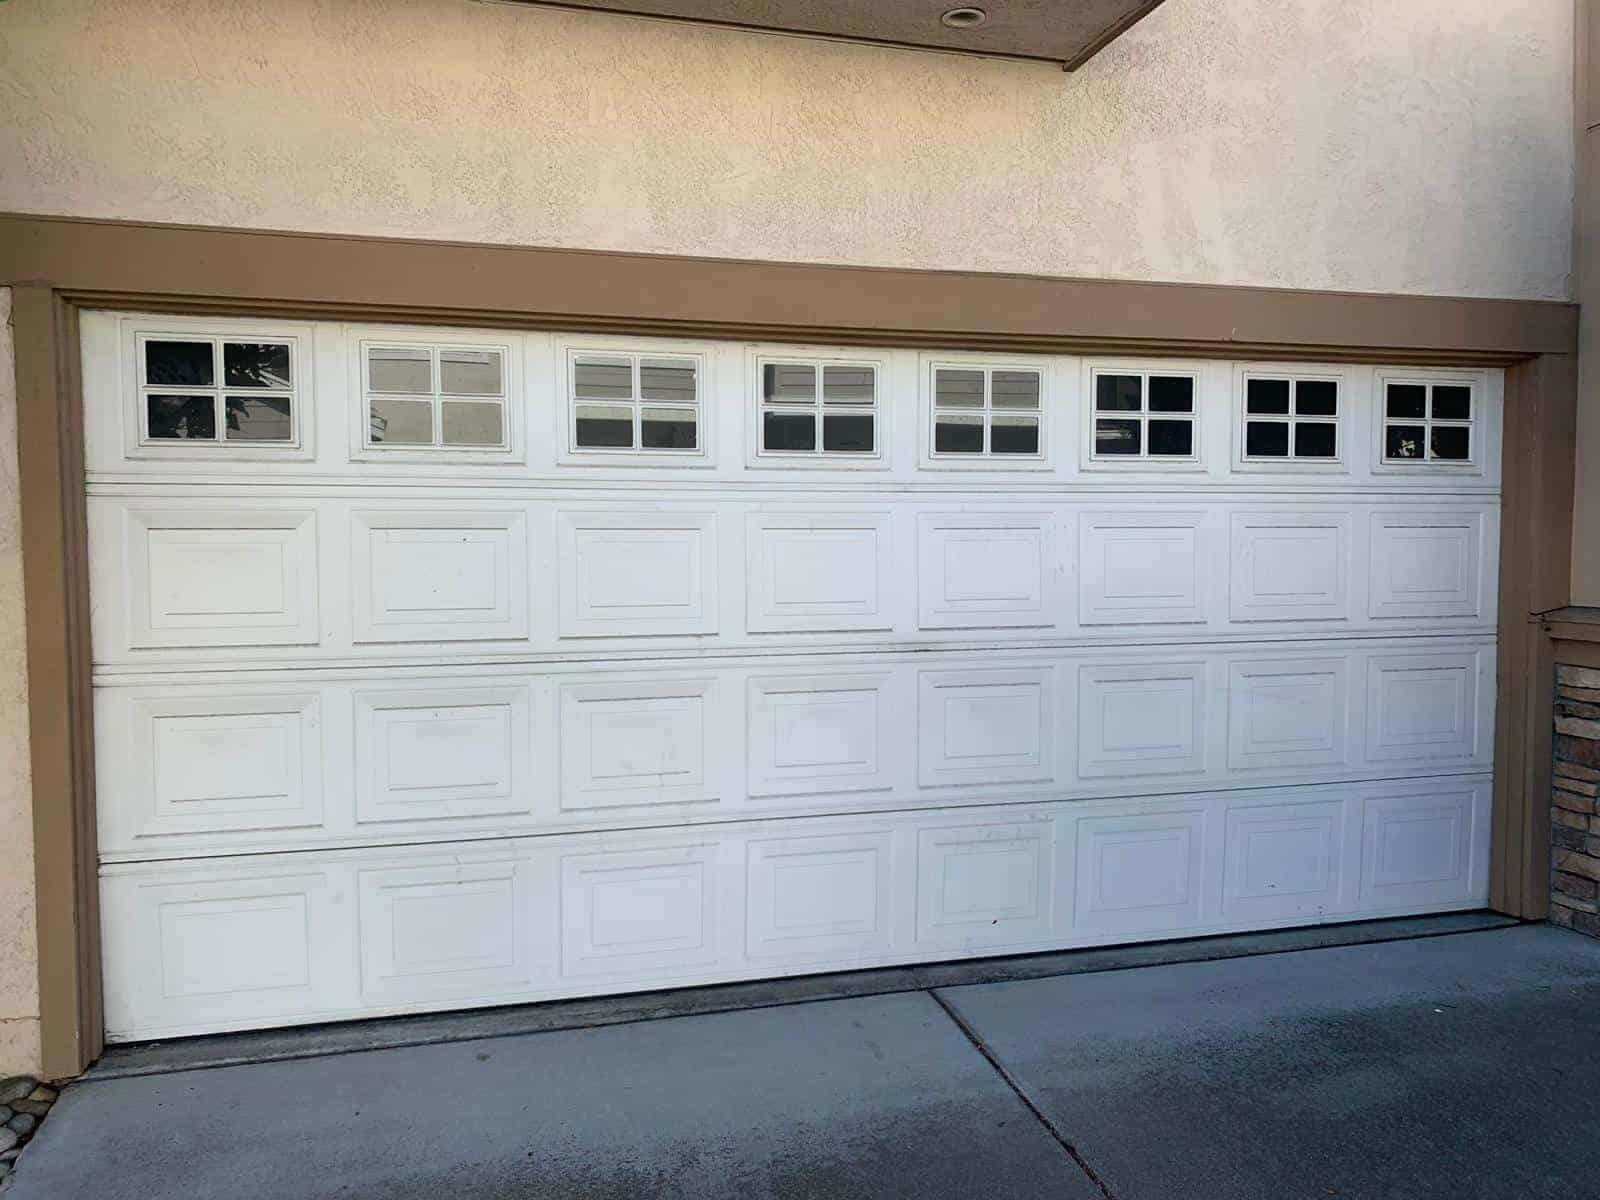 Lawndale CA Garage Door Repair & Replacement